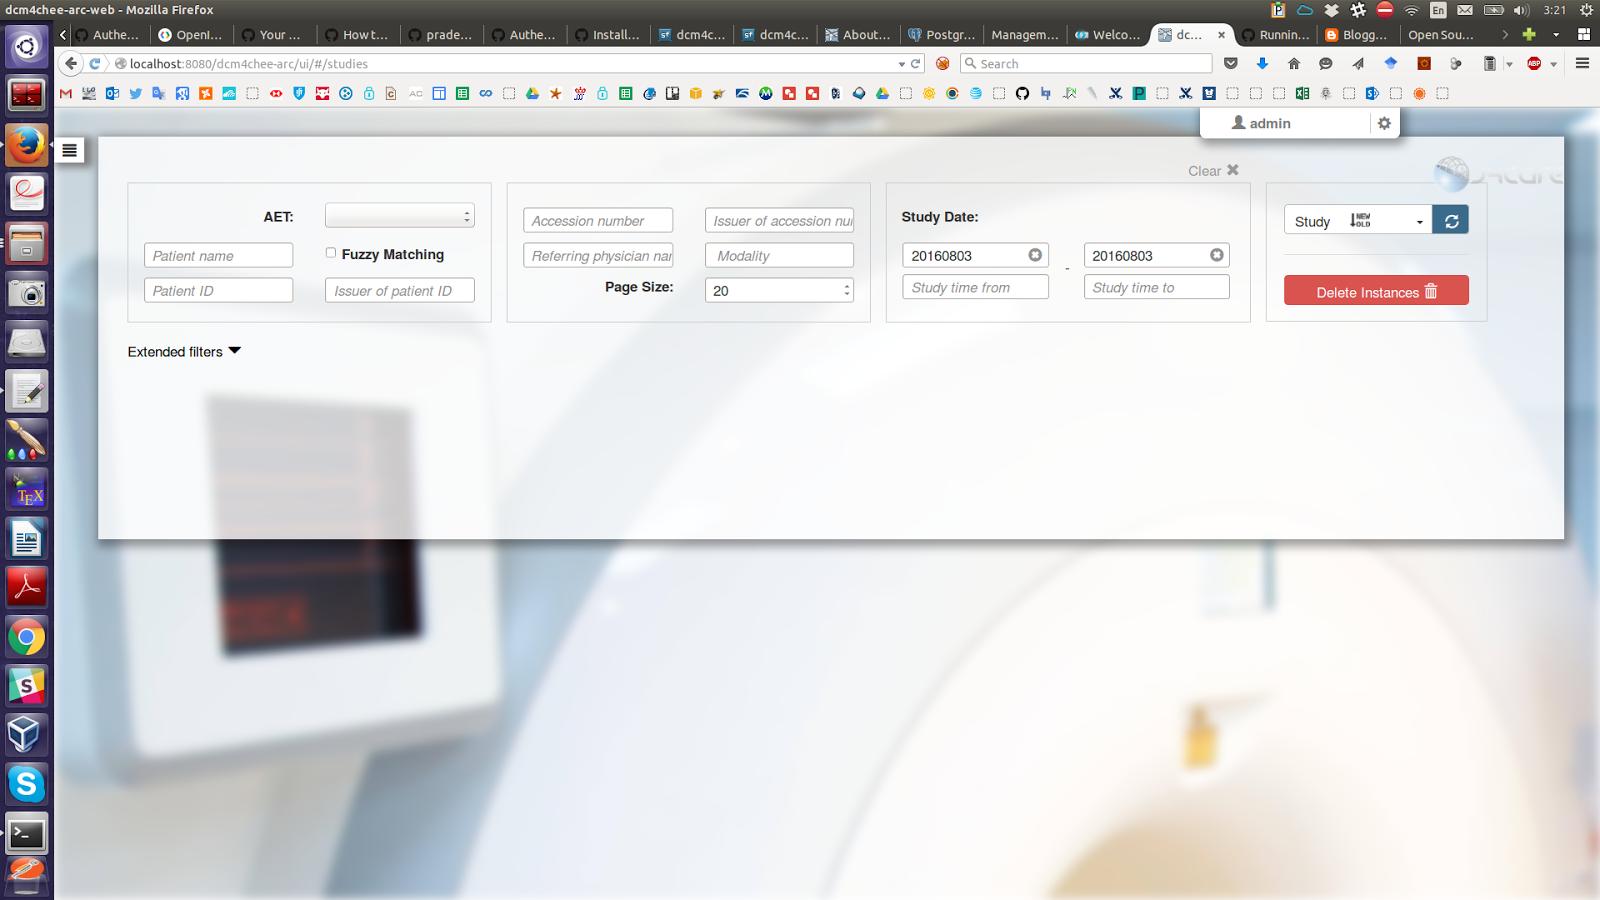 Llovizna: Installing DCM4CHEE using Docker